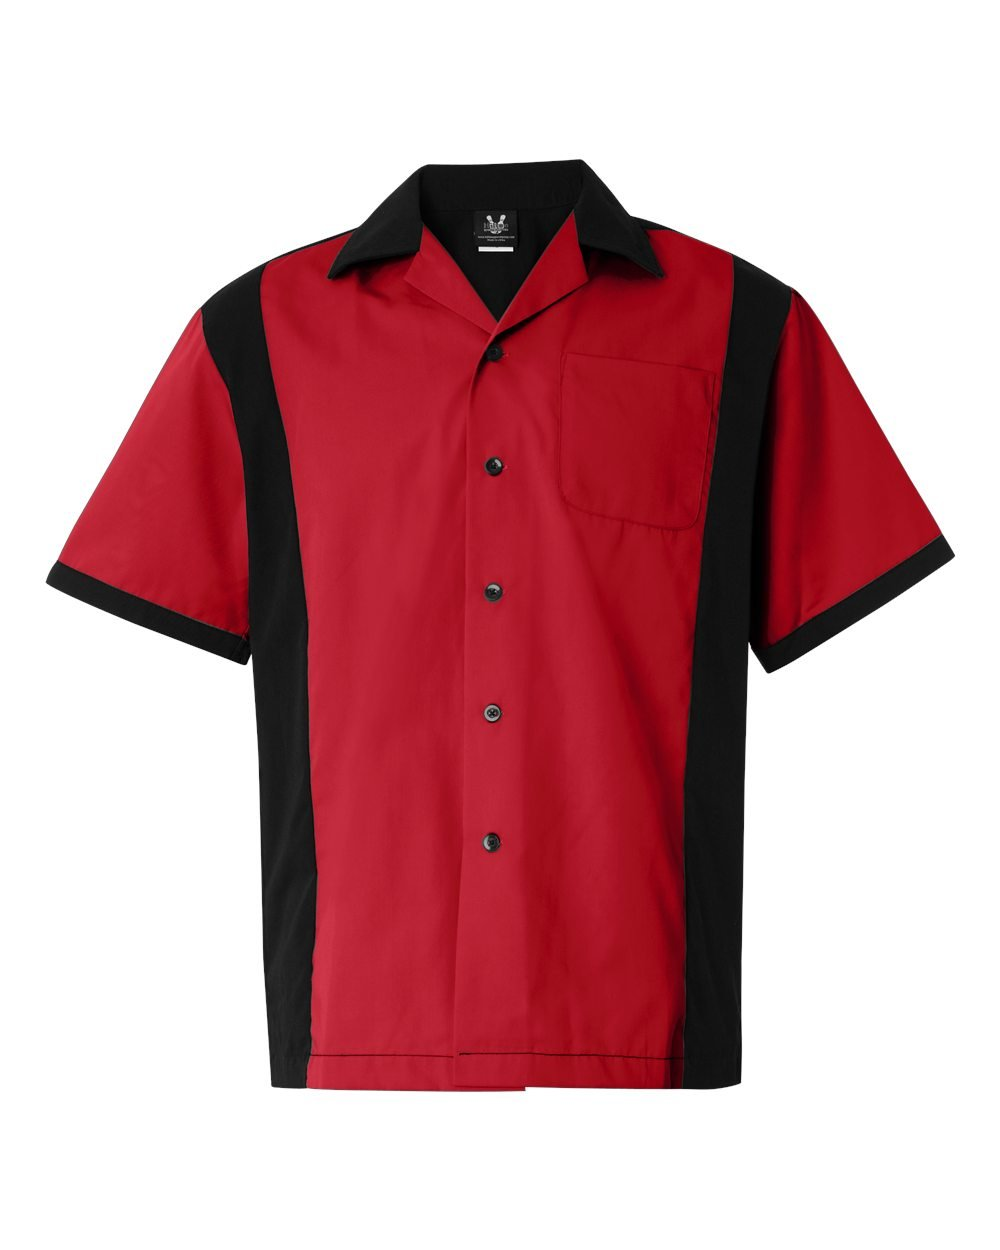 Hilton Bowling Retro Cruiser (Red_Black) (L) by Hilton